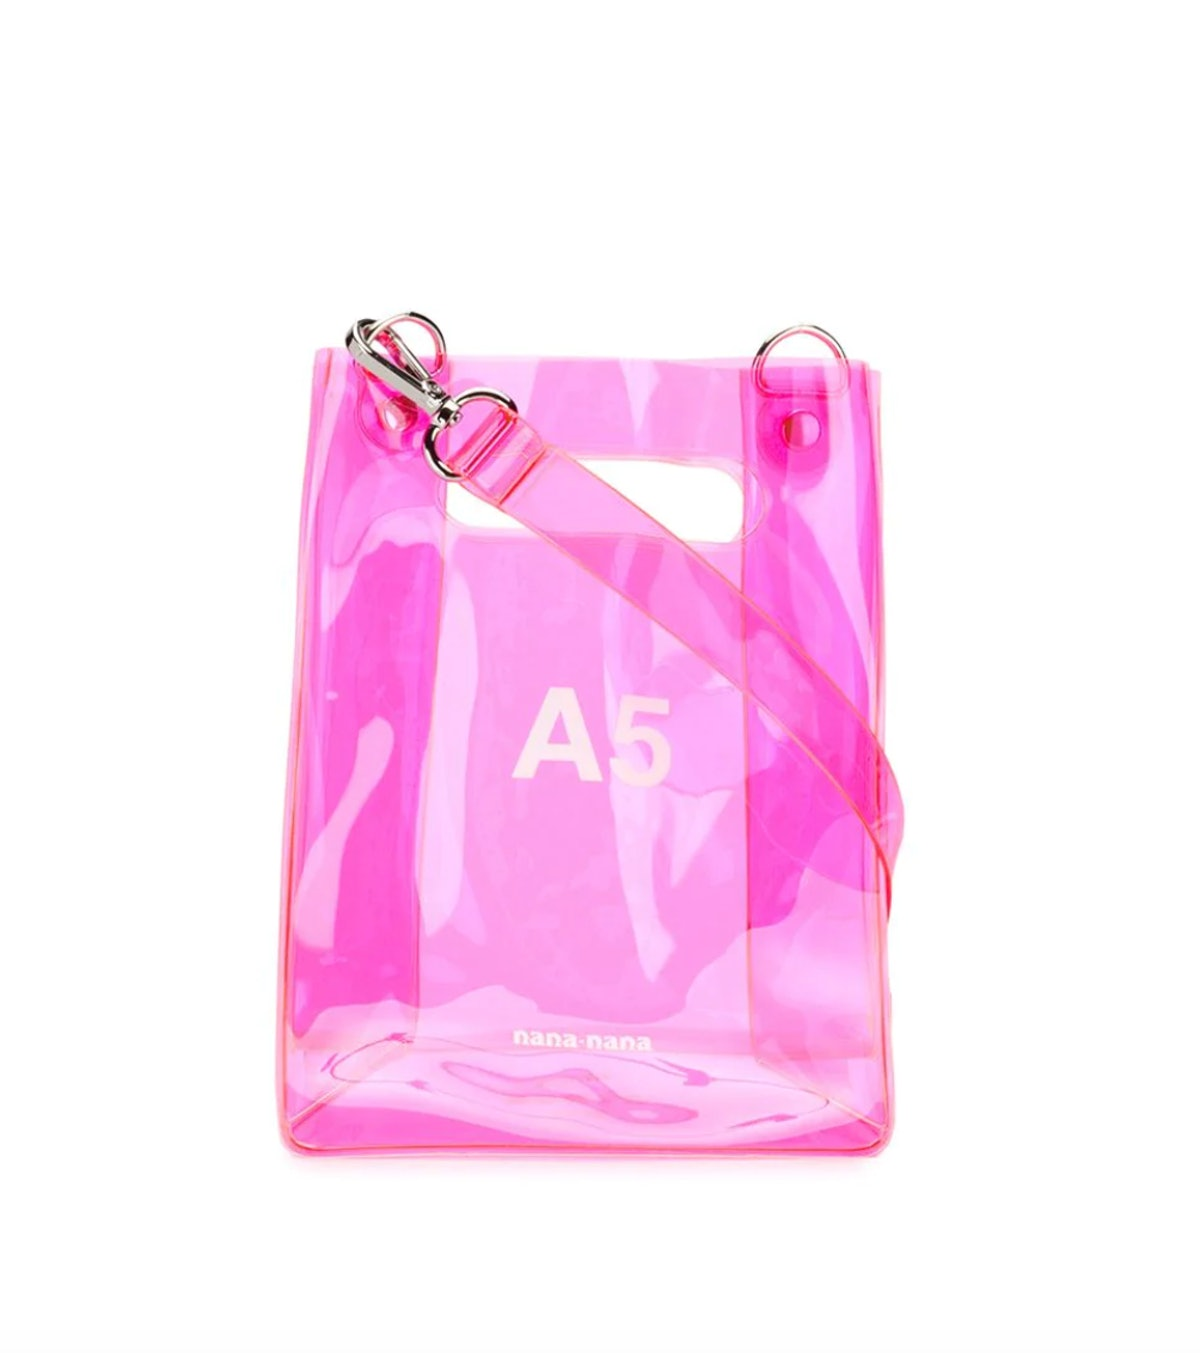 NANA-NANA A5 shoulder bag